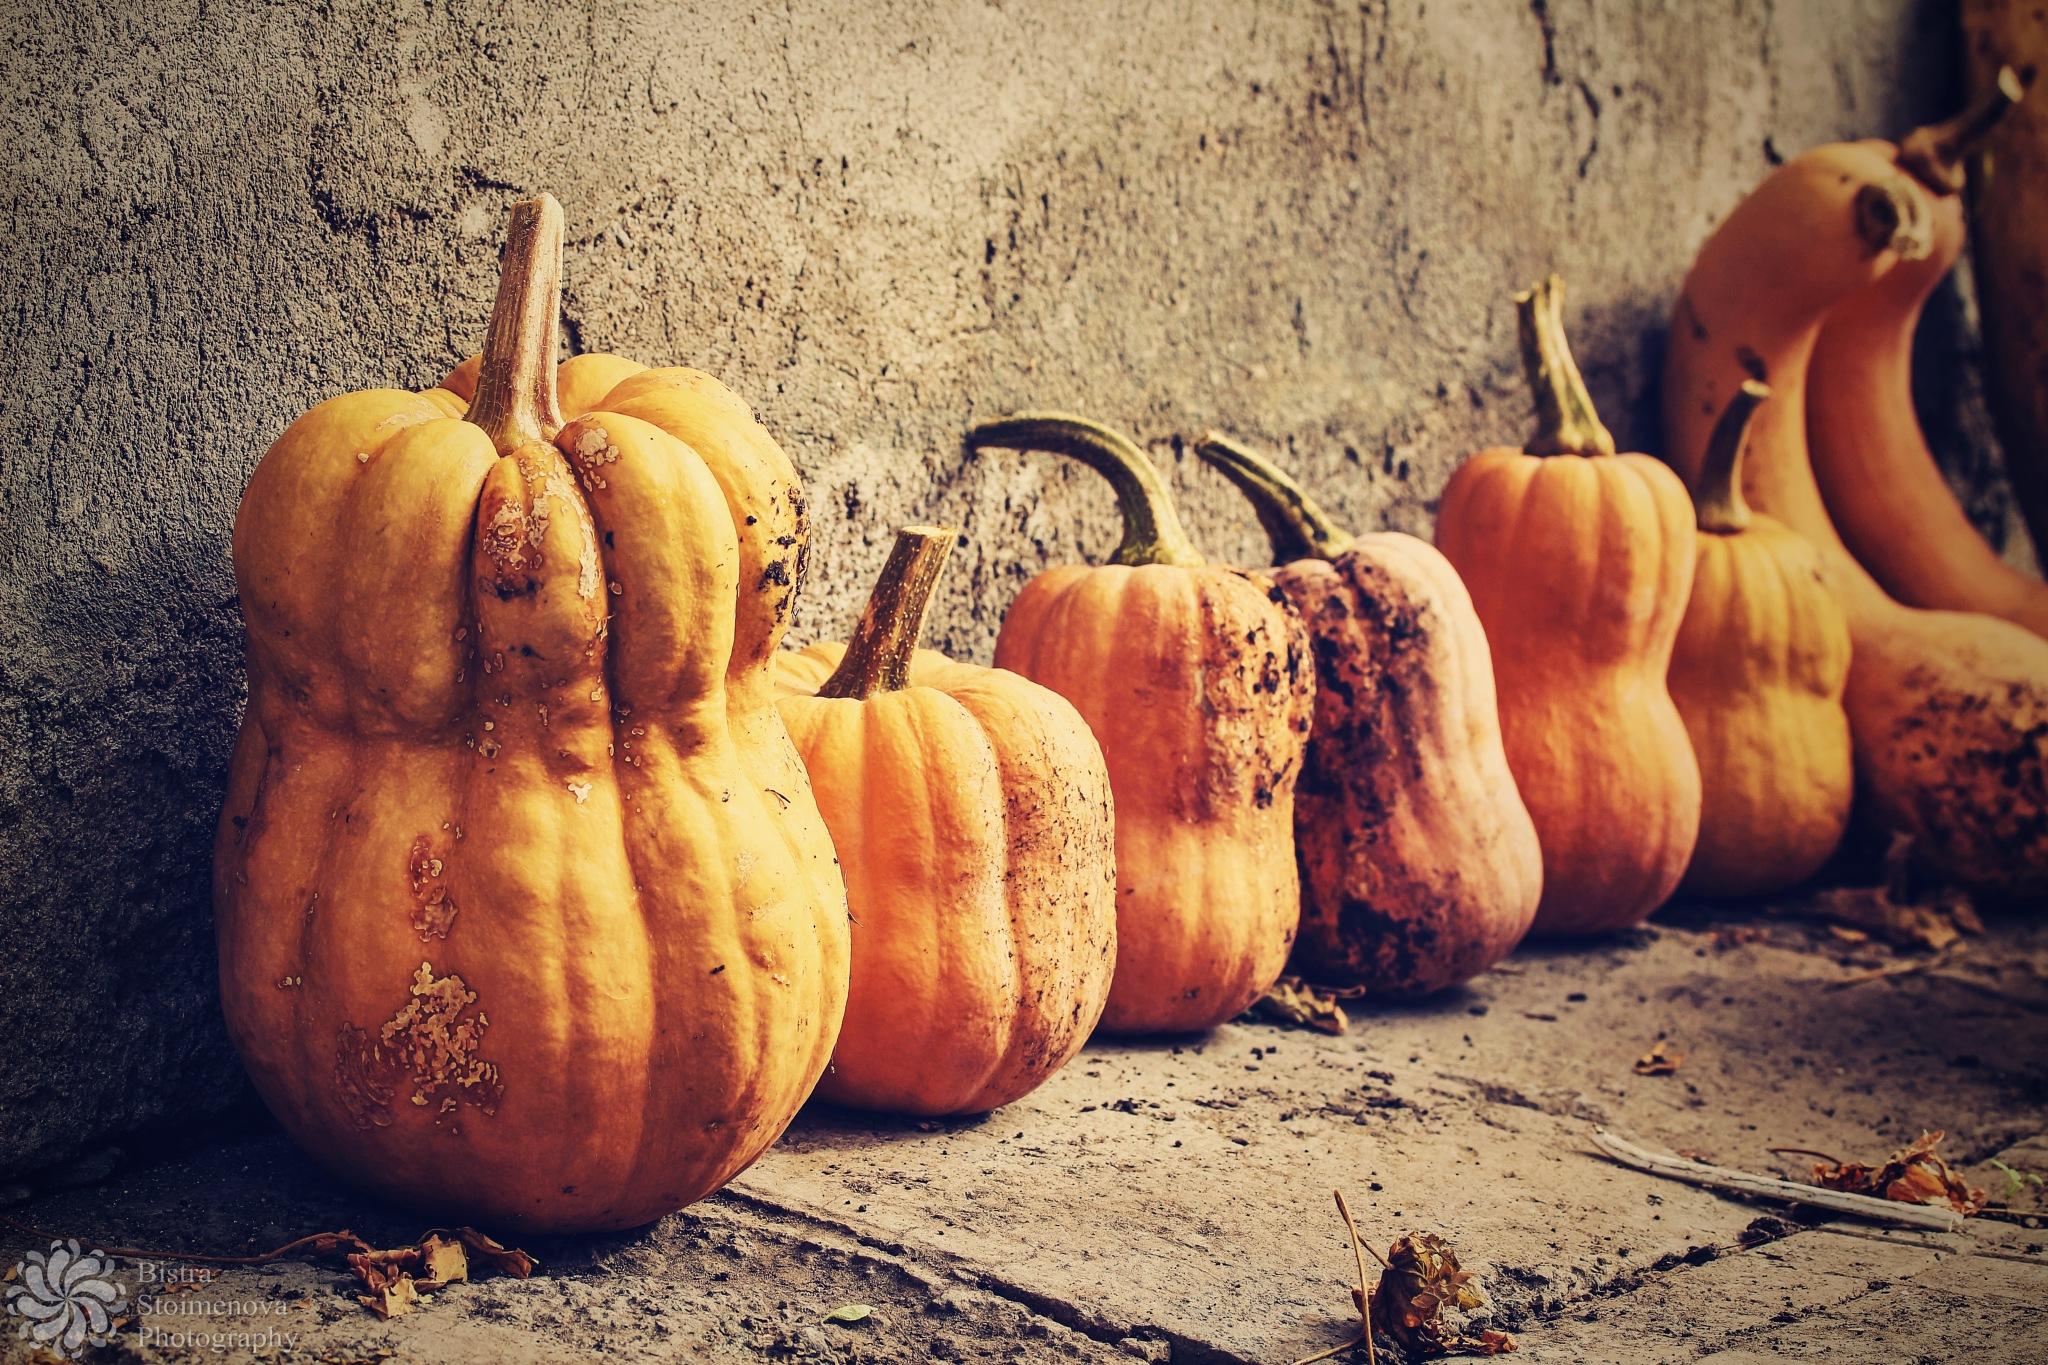 Happy Halloween by Bistra Stoimenova